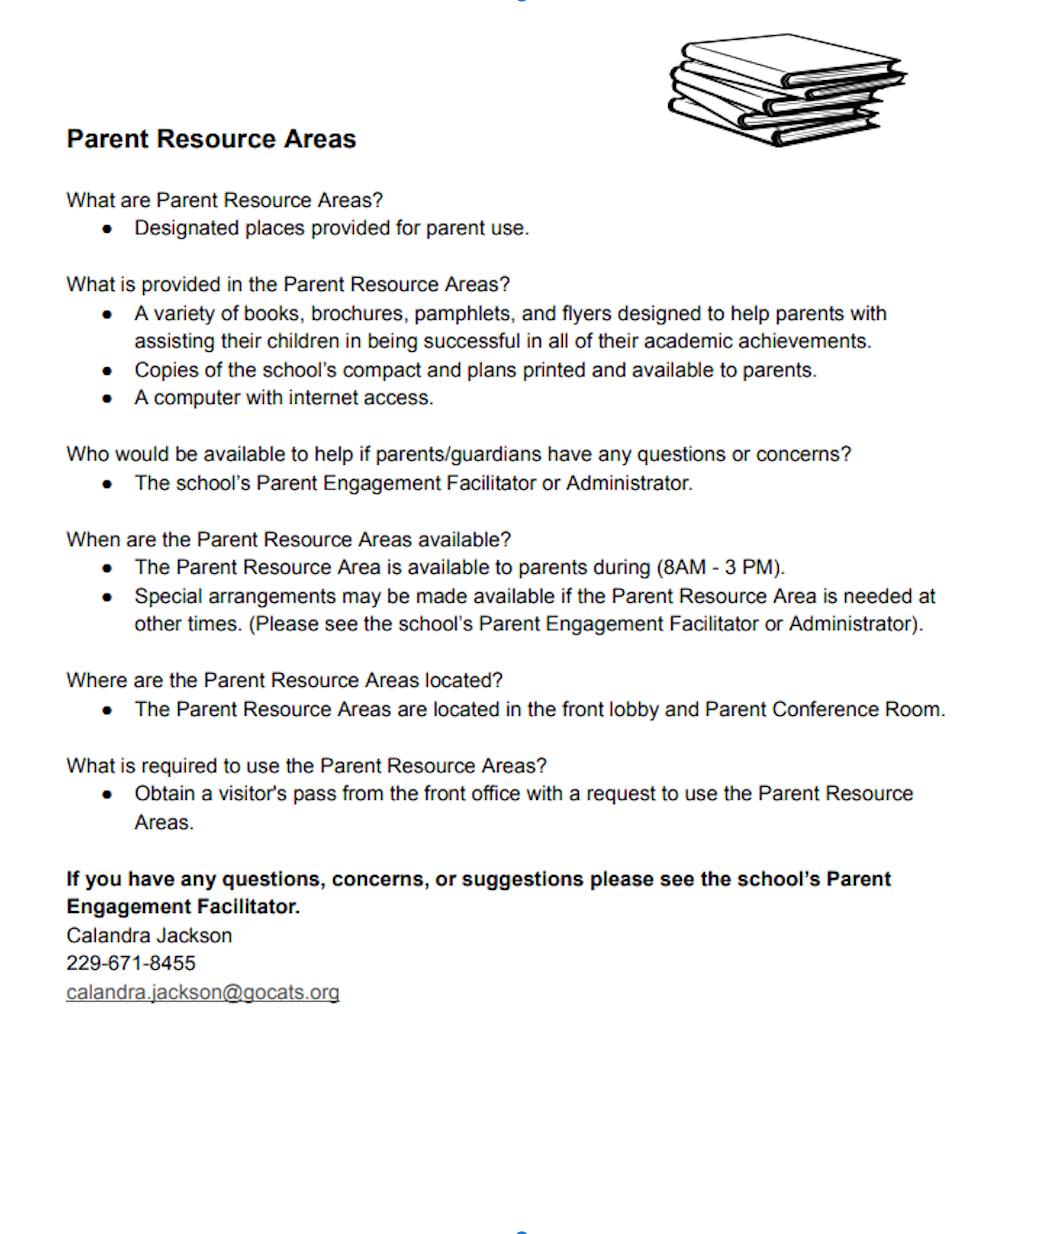 Parent Resource Areas